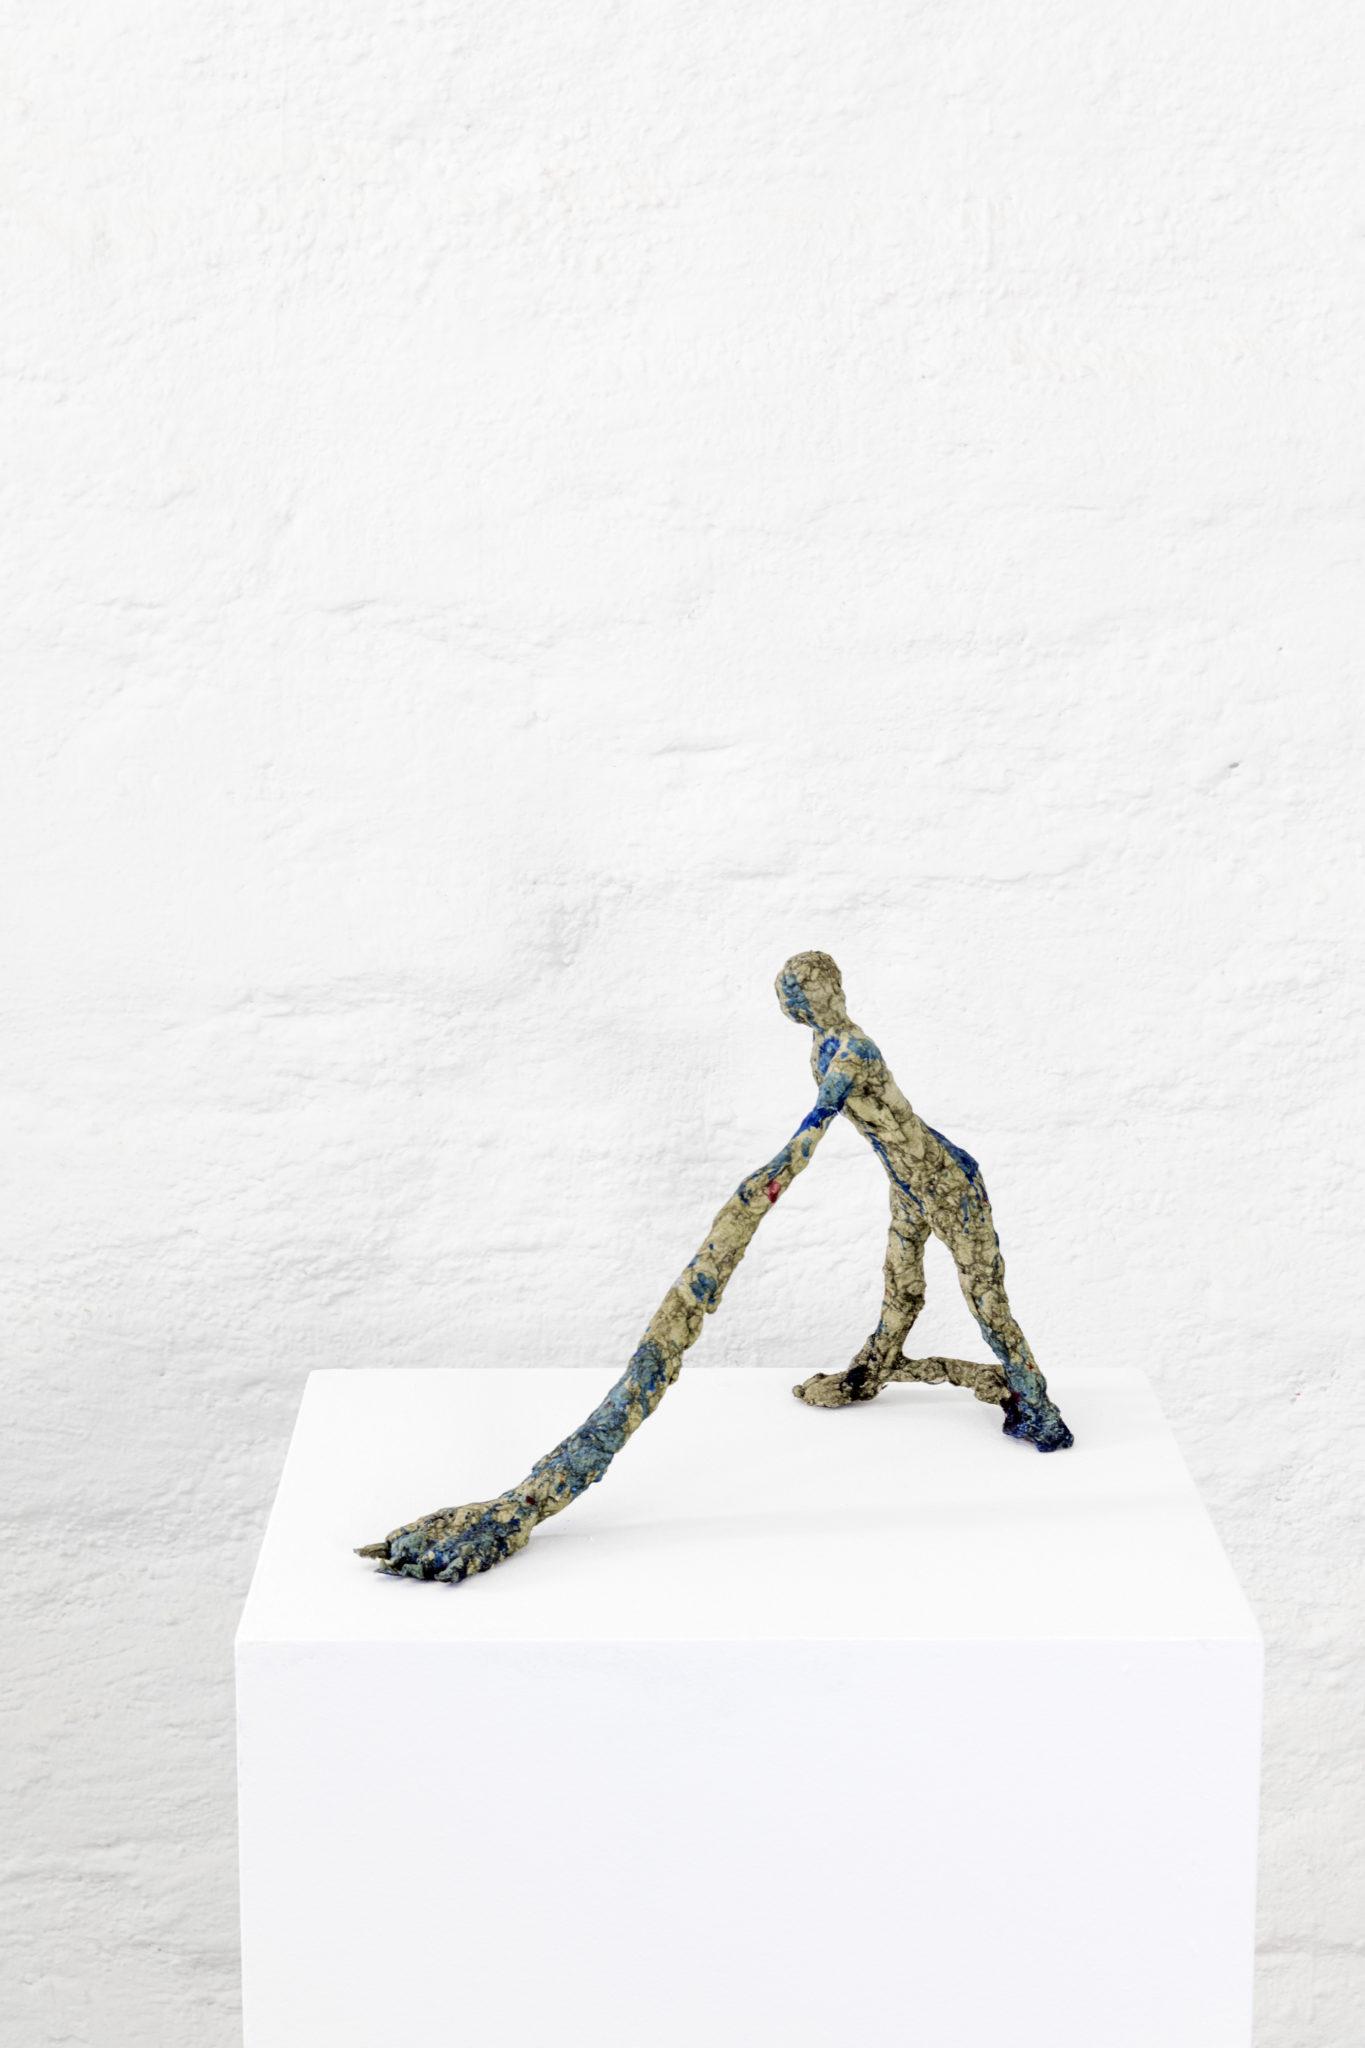 Nesren Shalgheen, Jetzt, Ton-Papier-Bindmittel, 30x40, 2017